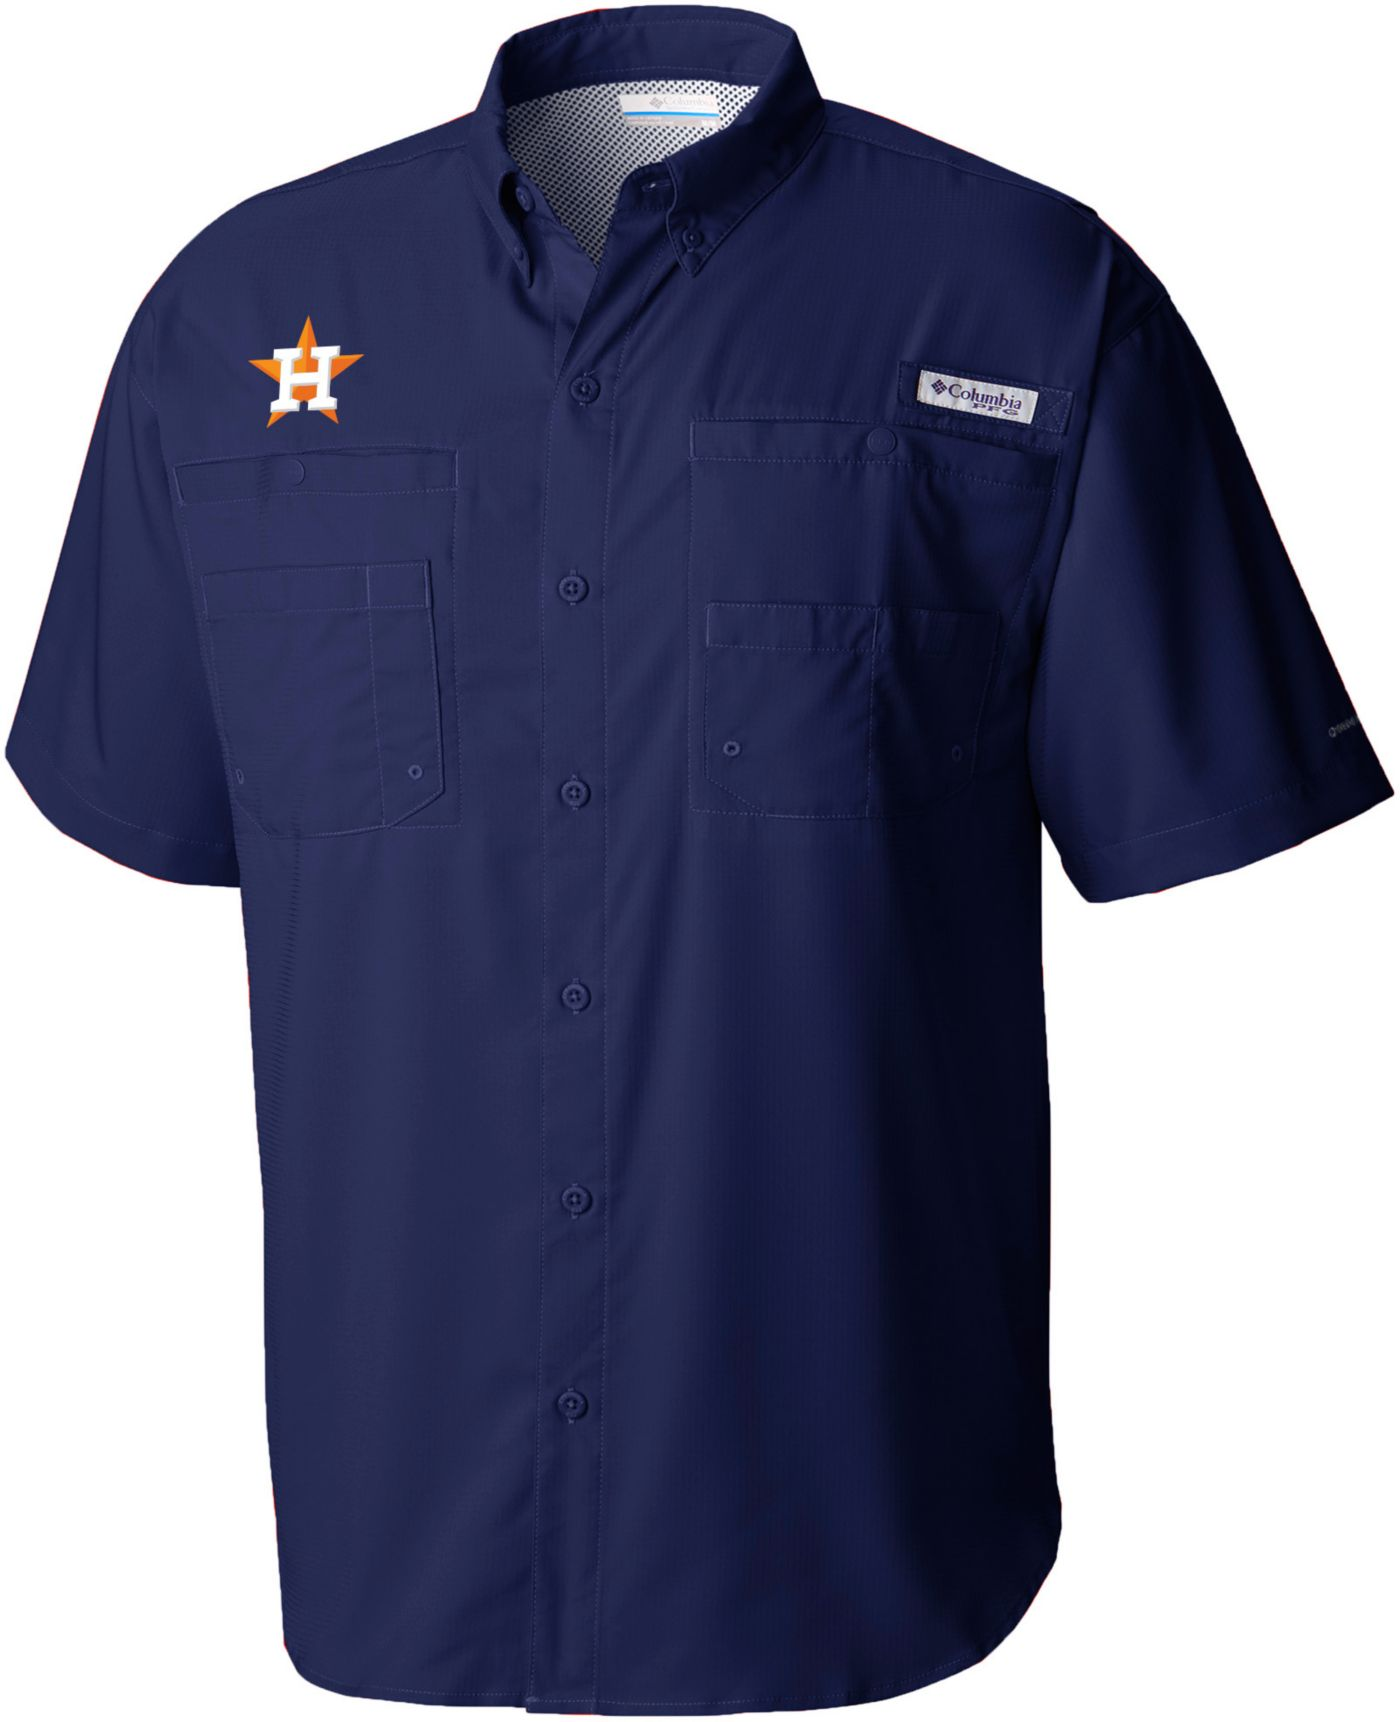 Columbia Men's Houston Astros Navy Tamiami Performance Short Sleeve Shirt